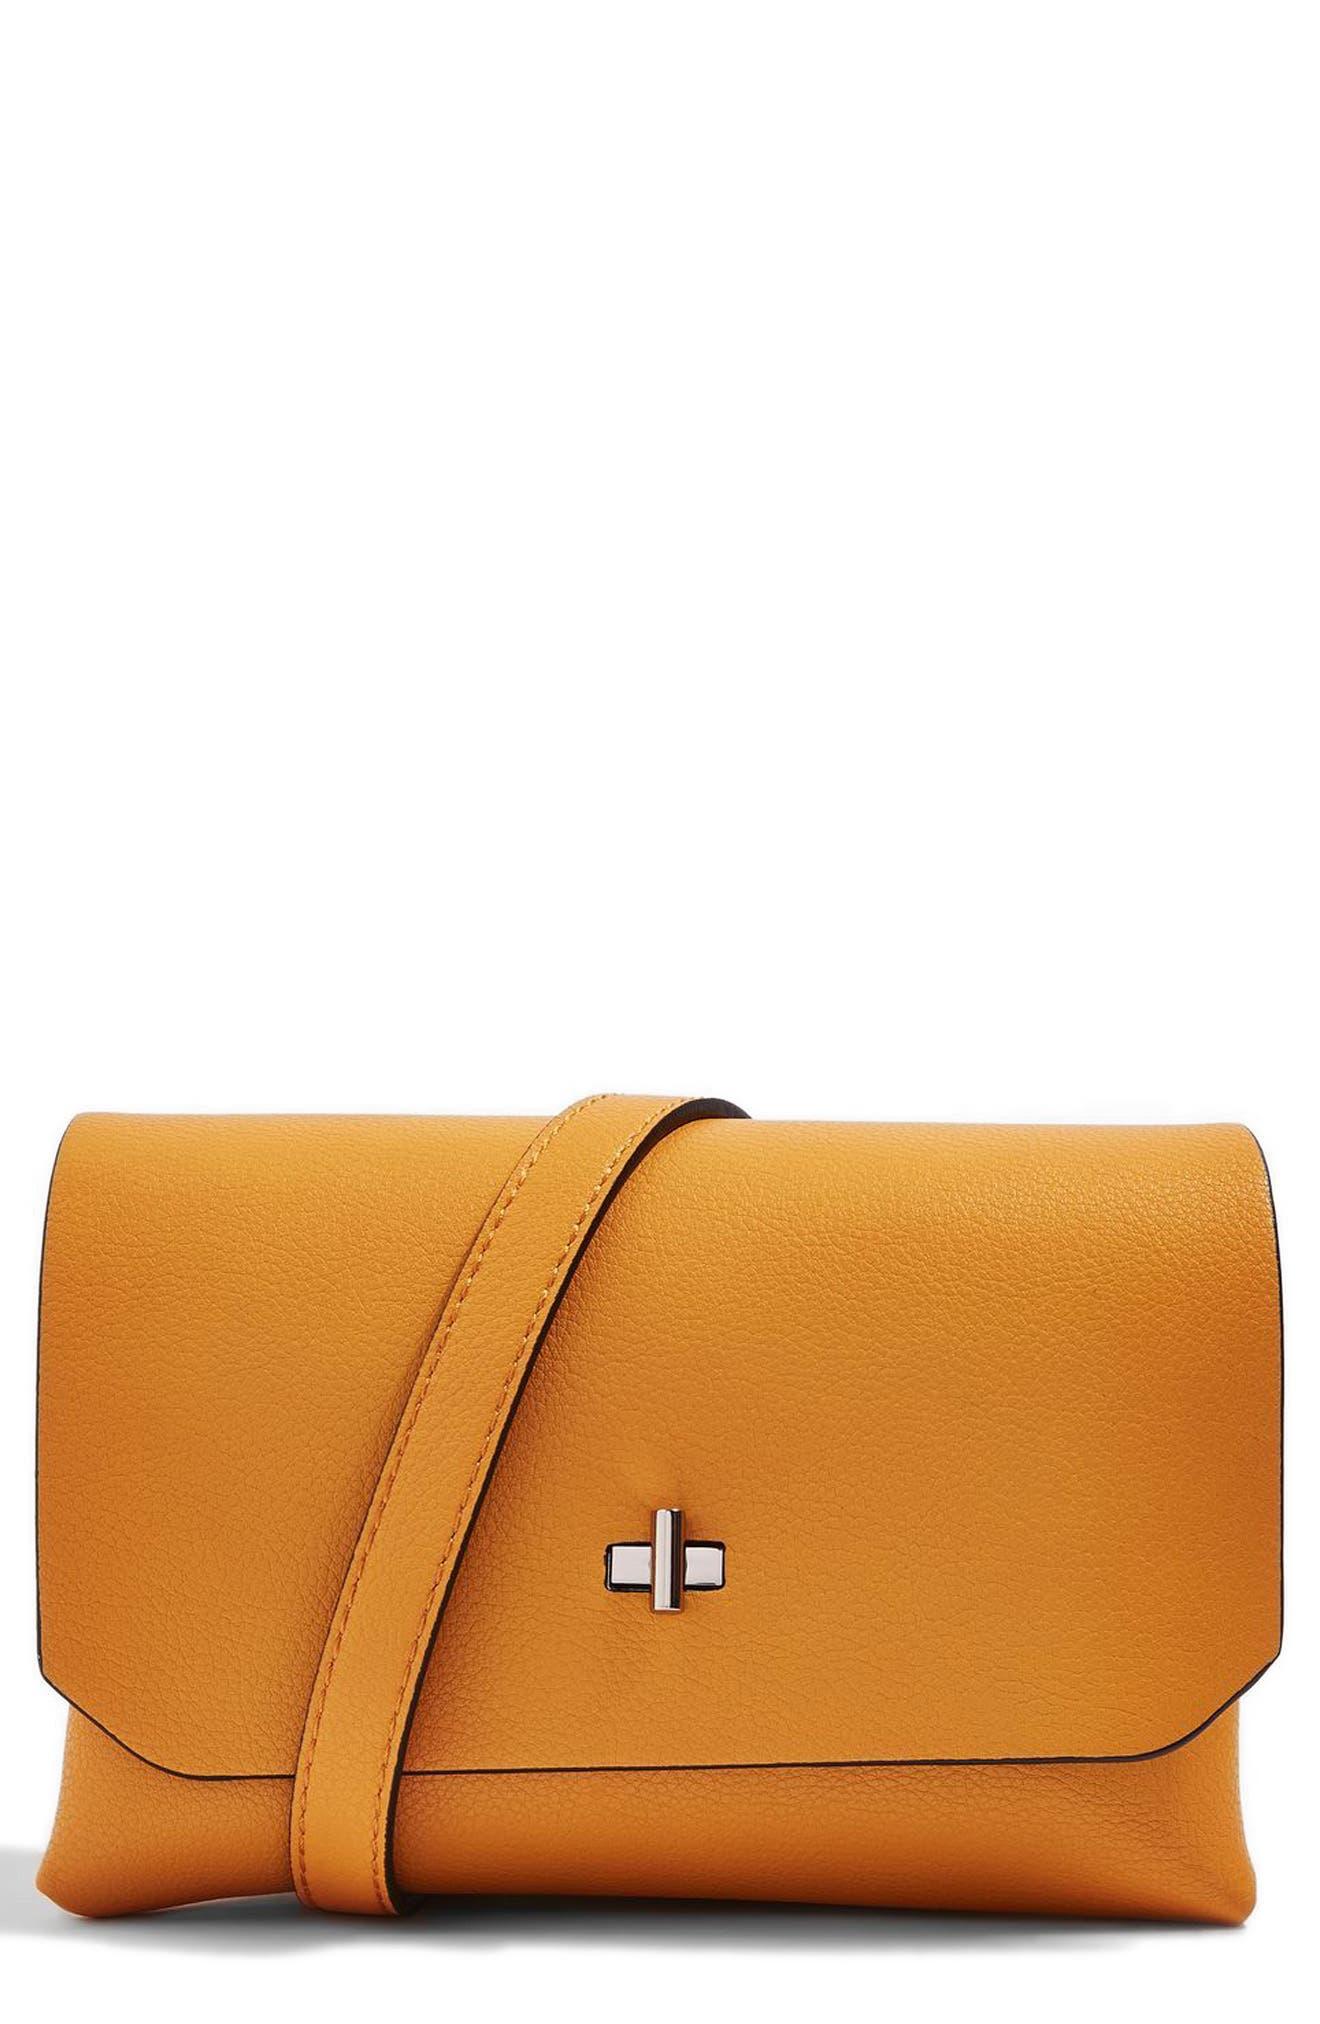 Otley Faux Leather Crossbody Bag,                             Main thumbnail 1, color,                             700